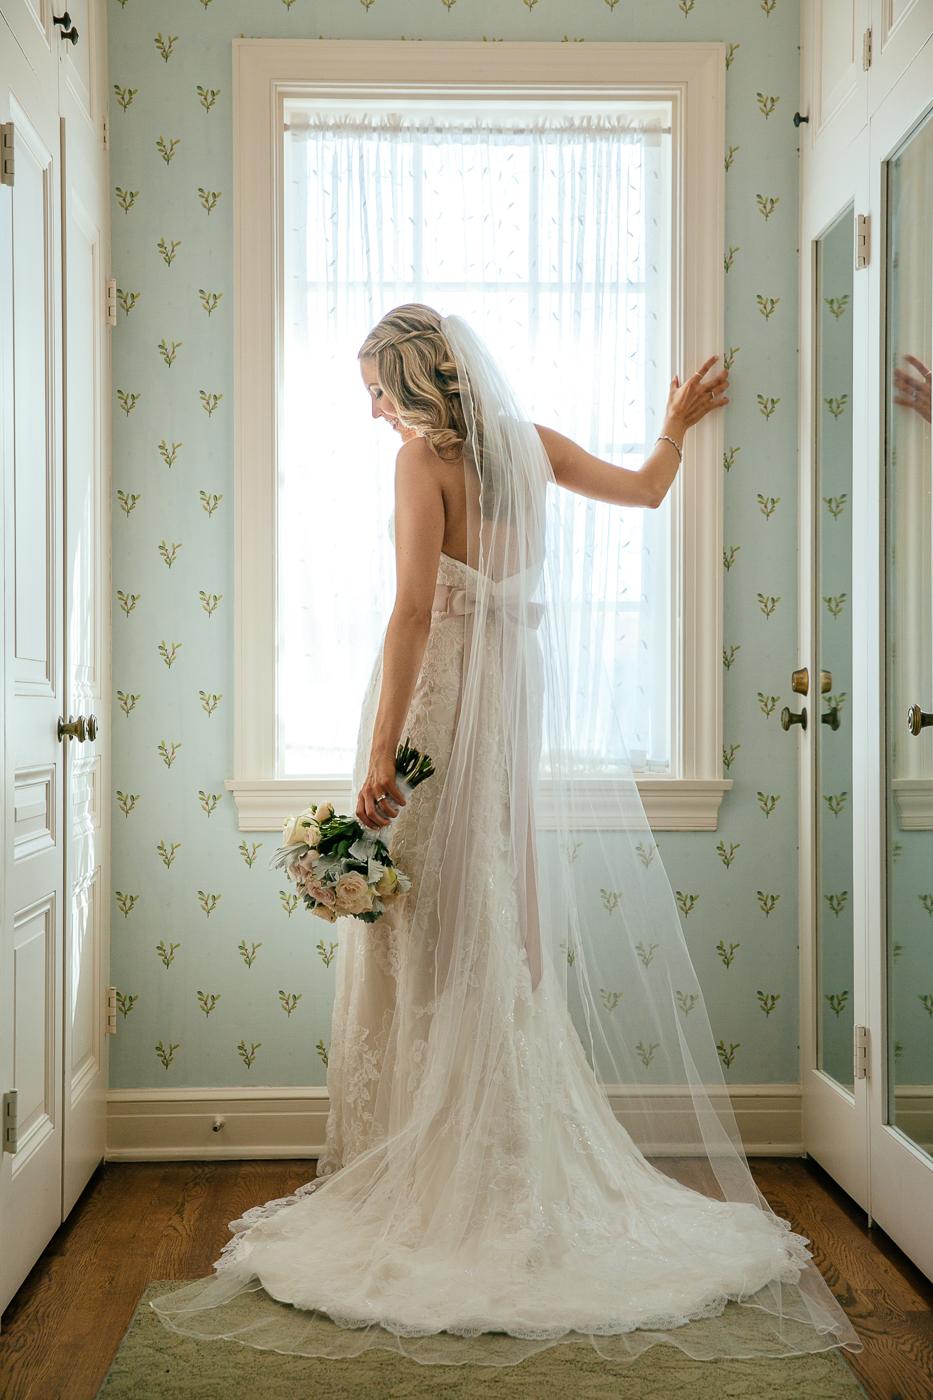 RYAN_&_KELLEY_DARLINGTON_HOUSE_WEDDING_2014_7X9A1713.JPG